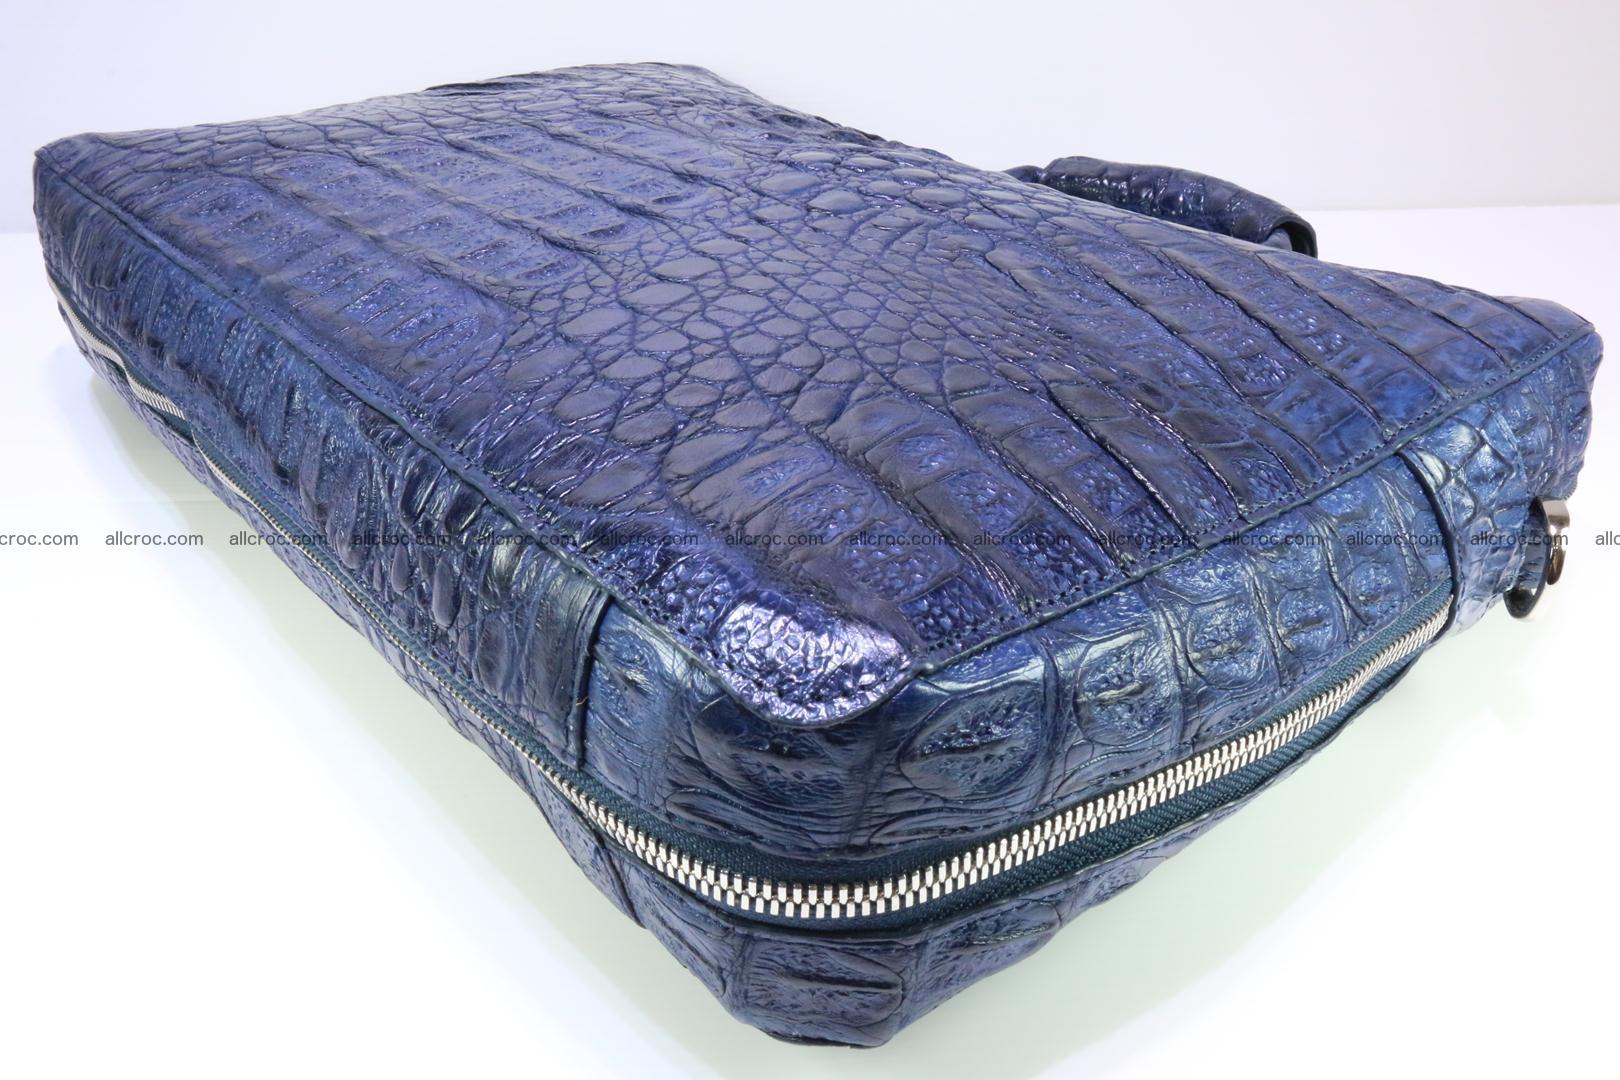 Crocodile skin handbag 423 Foto 10